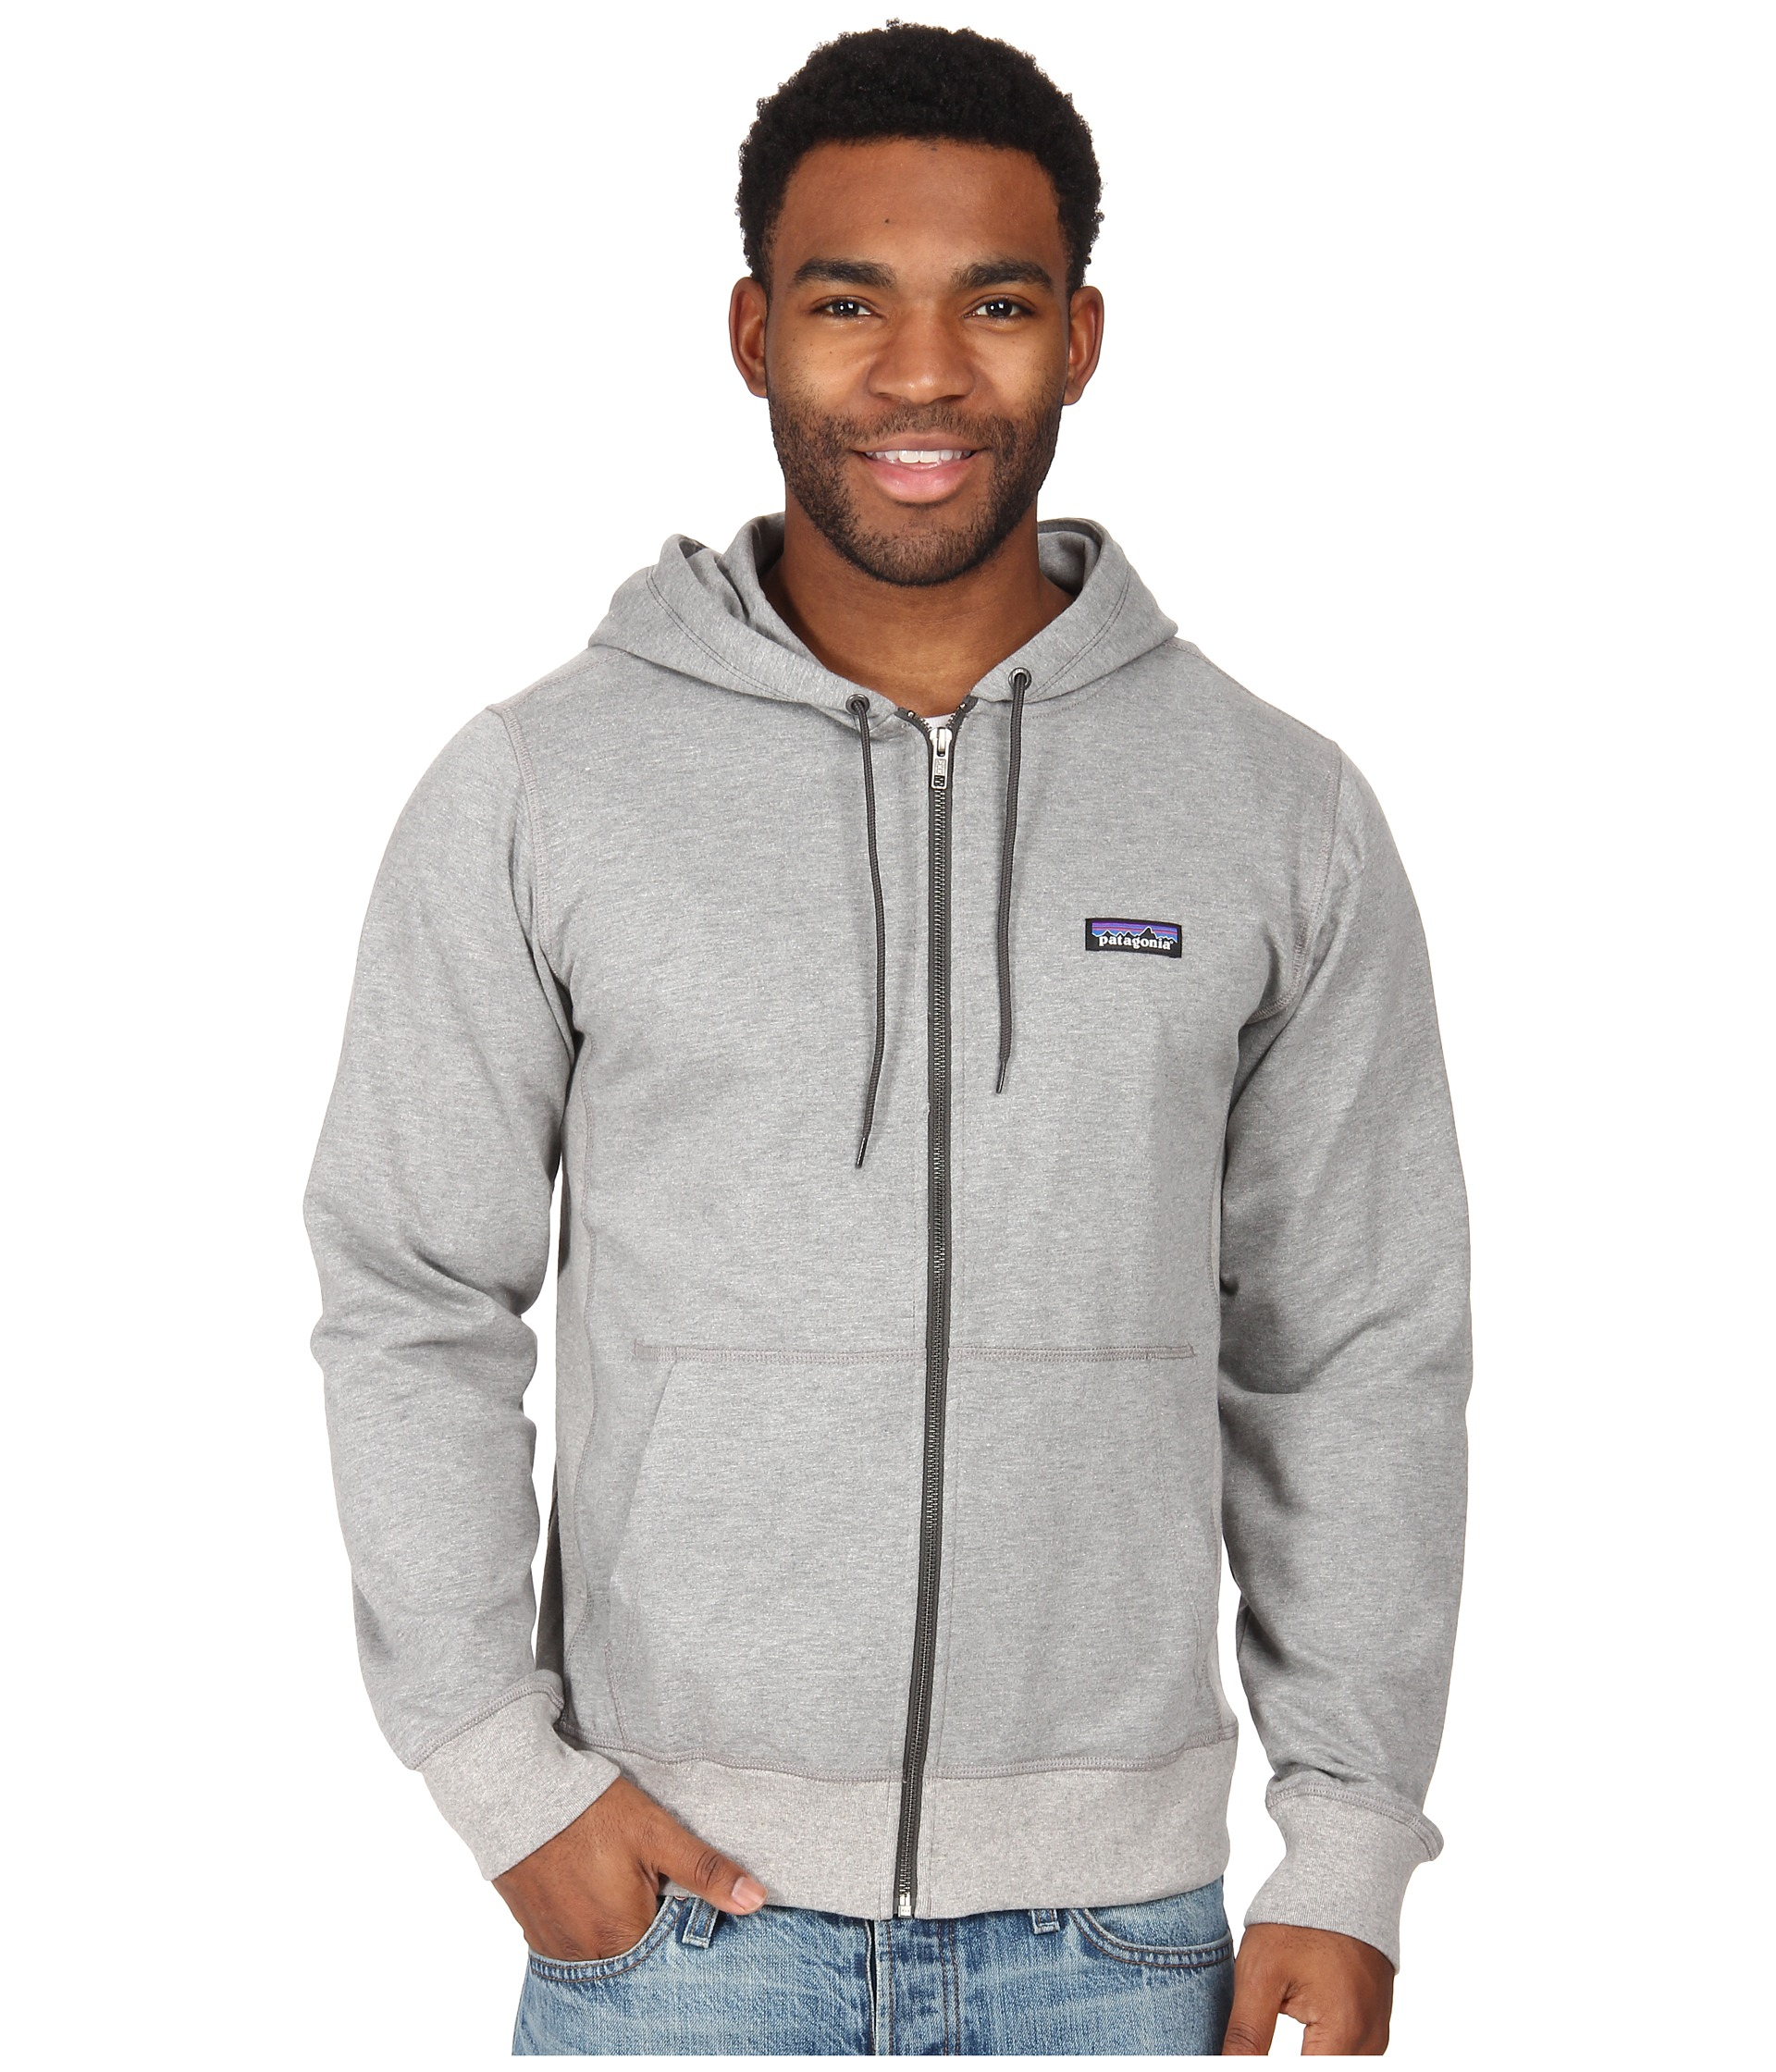 Men'S Lightweight Full Zip Hoodie | Fashion Ql